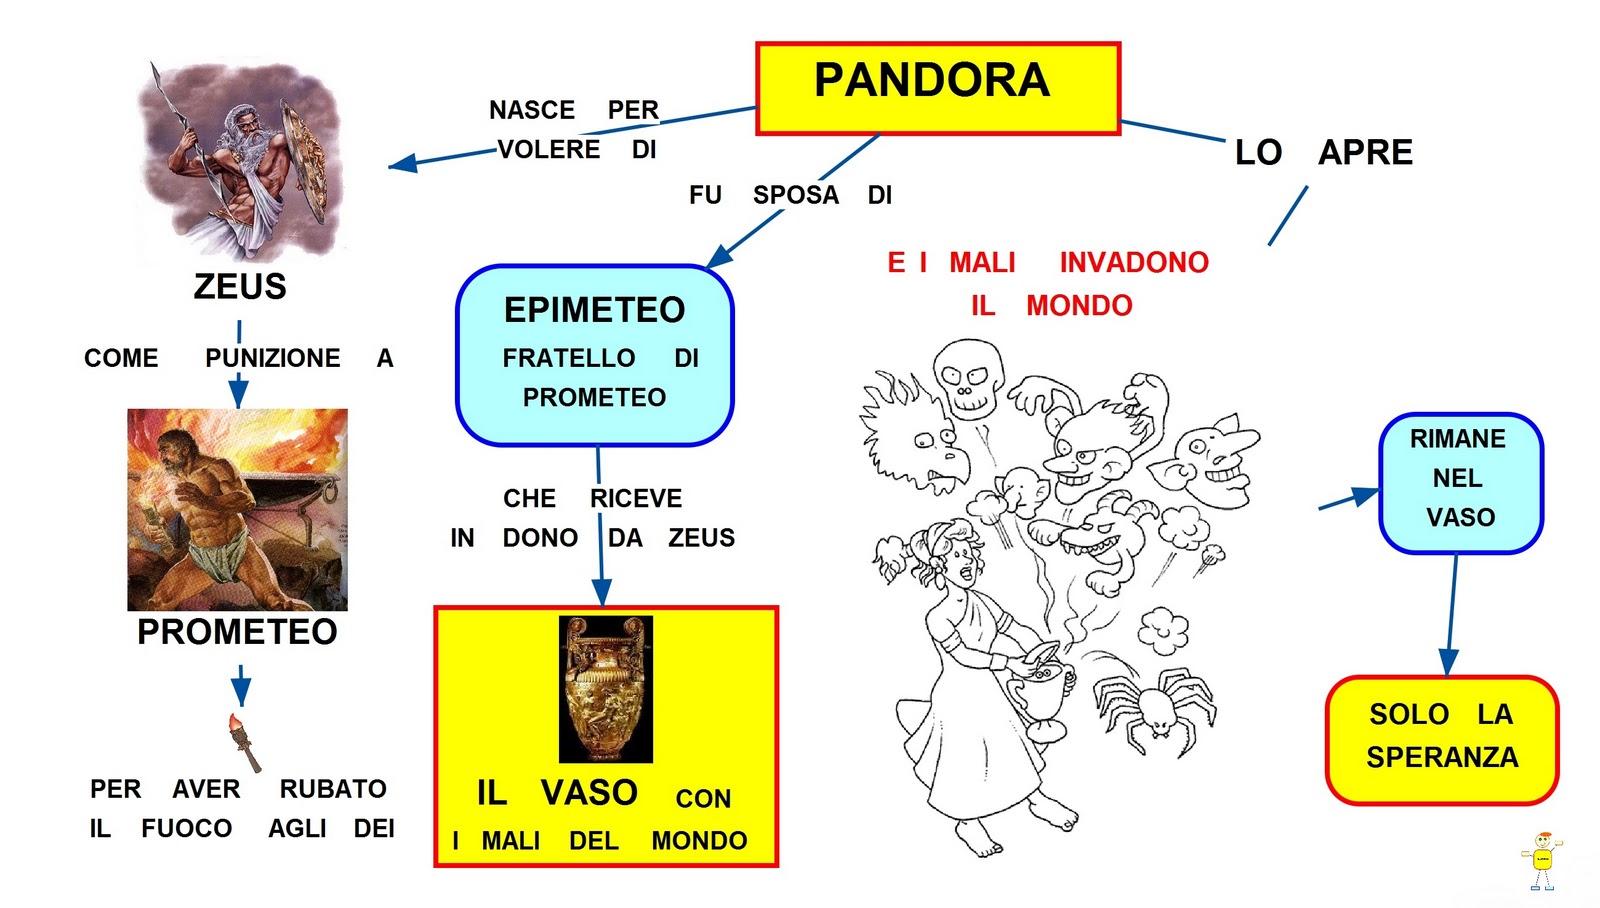 Riassunto il vaso di pandora 28 images pandora for Mito vaso di pandora